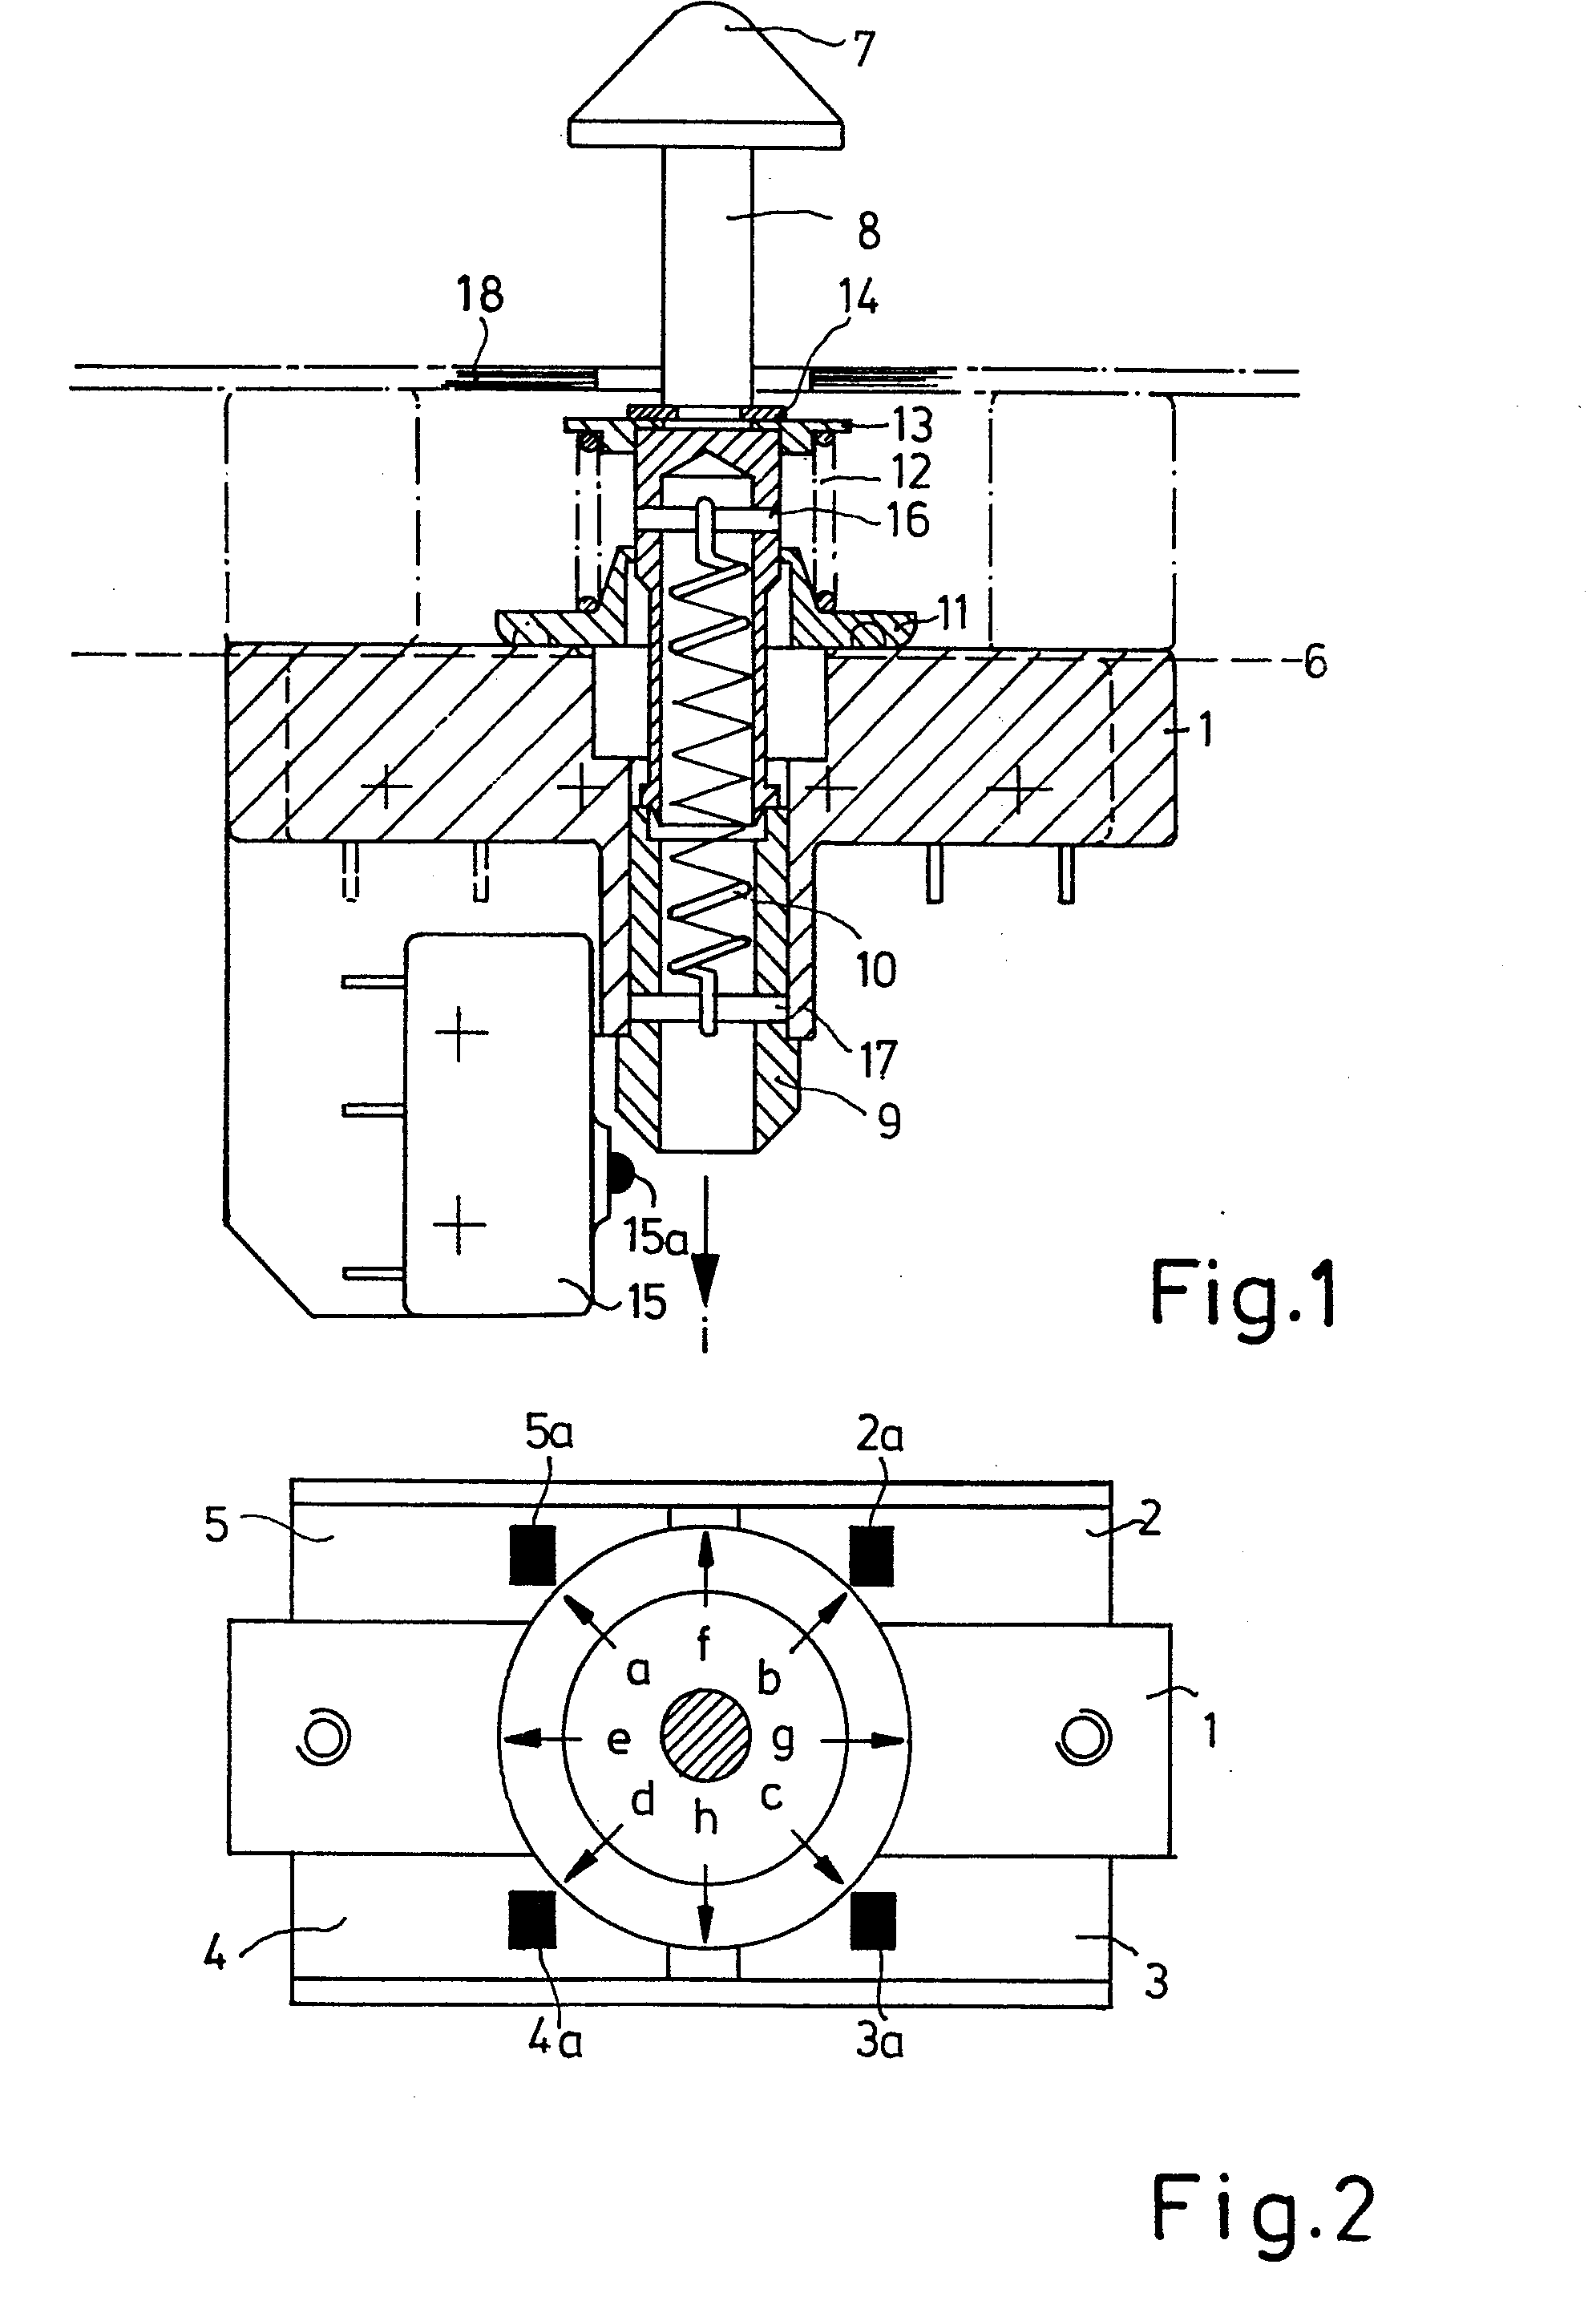 专利ep0134612a2 - schalteranordnung